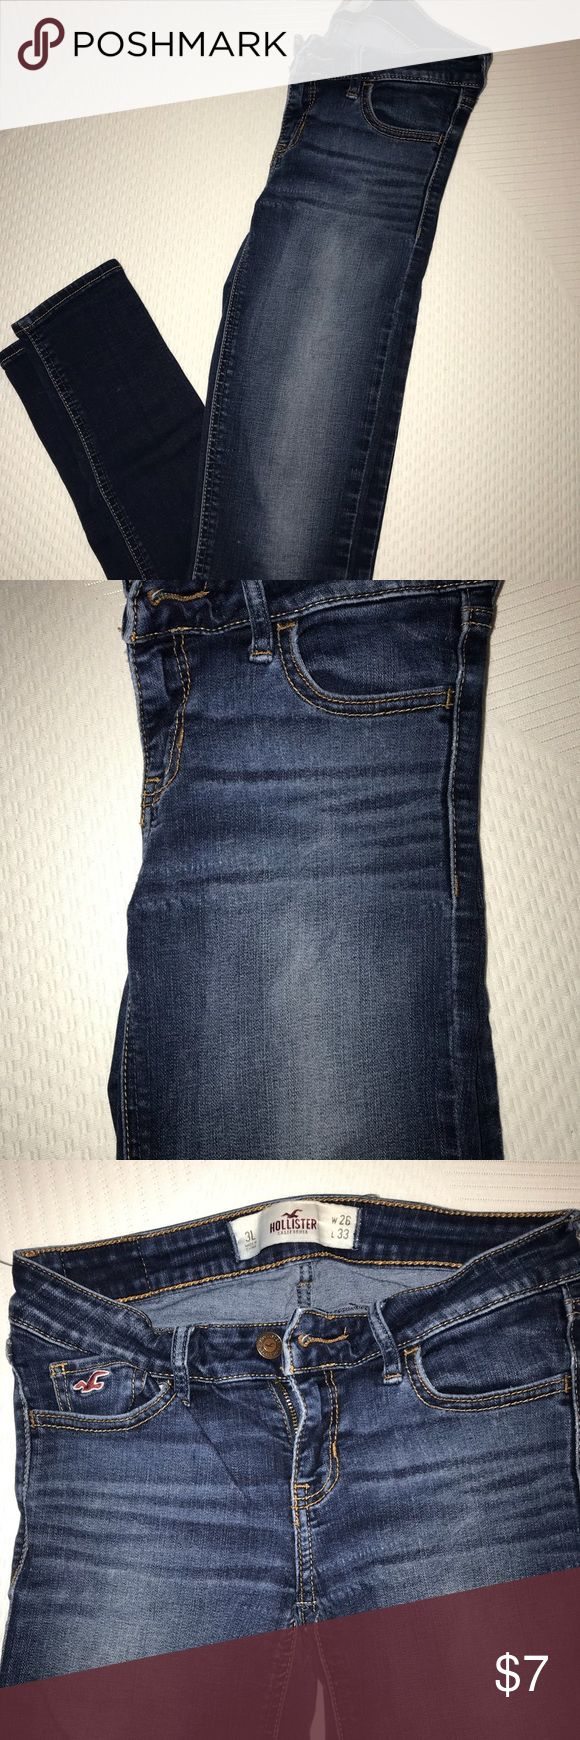 do hollister jeans stretch